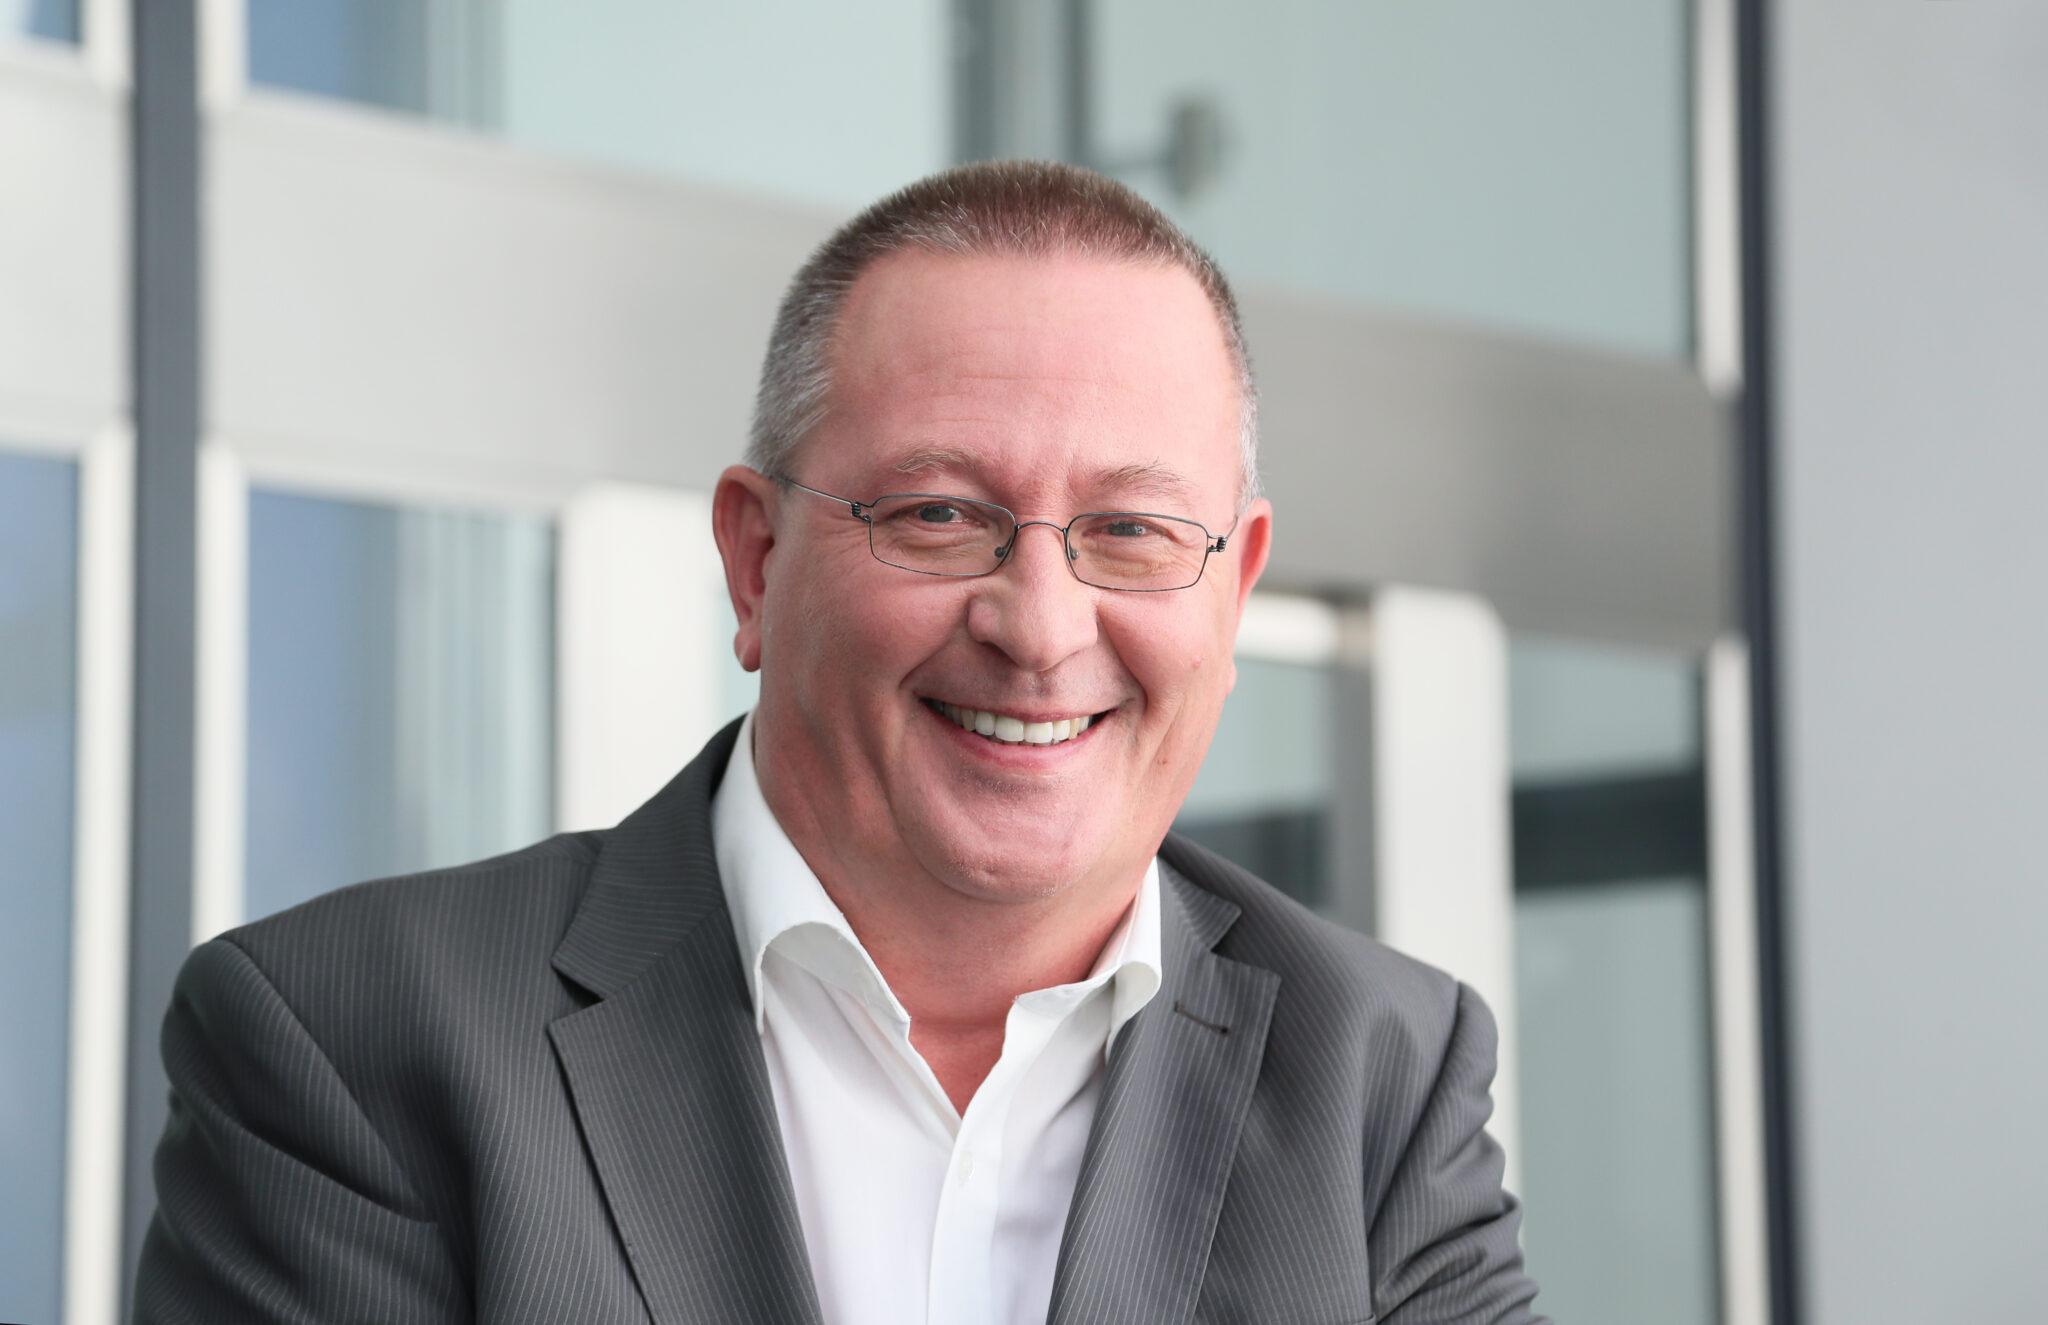 David Winter, Executive Vice President